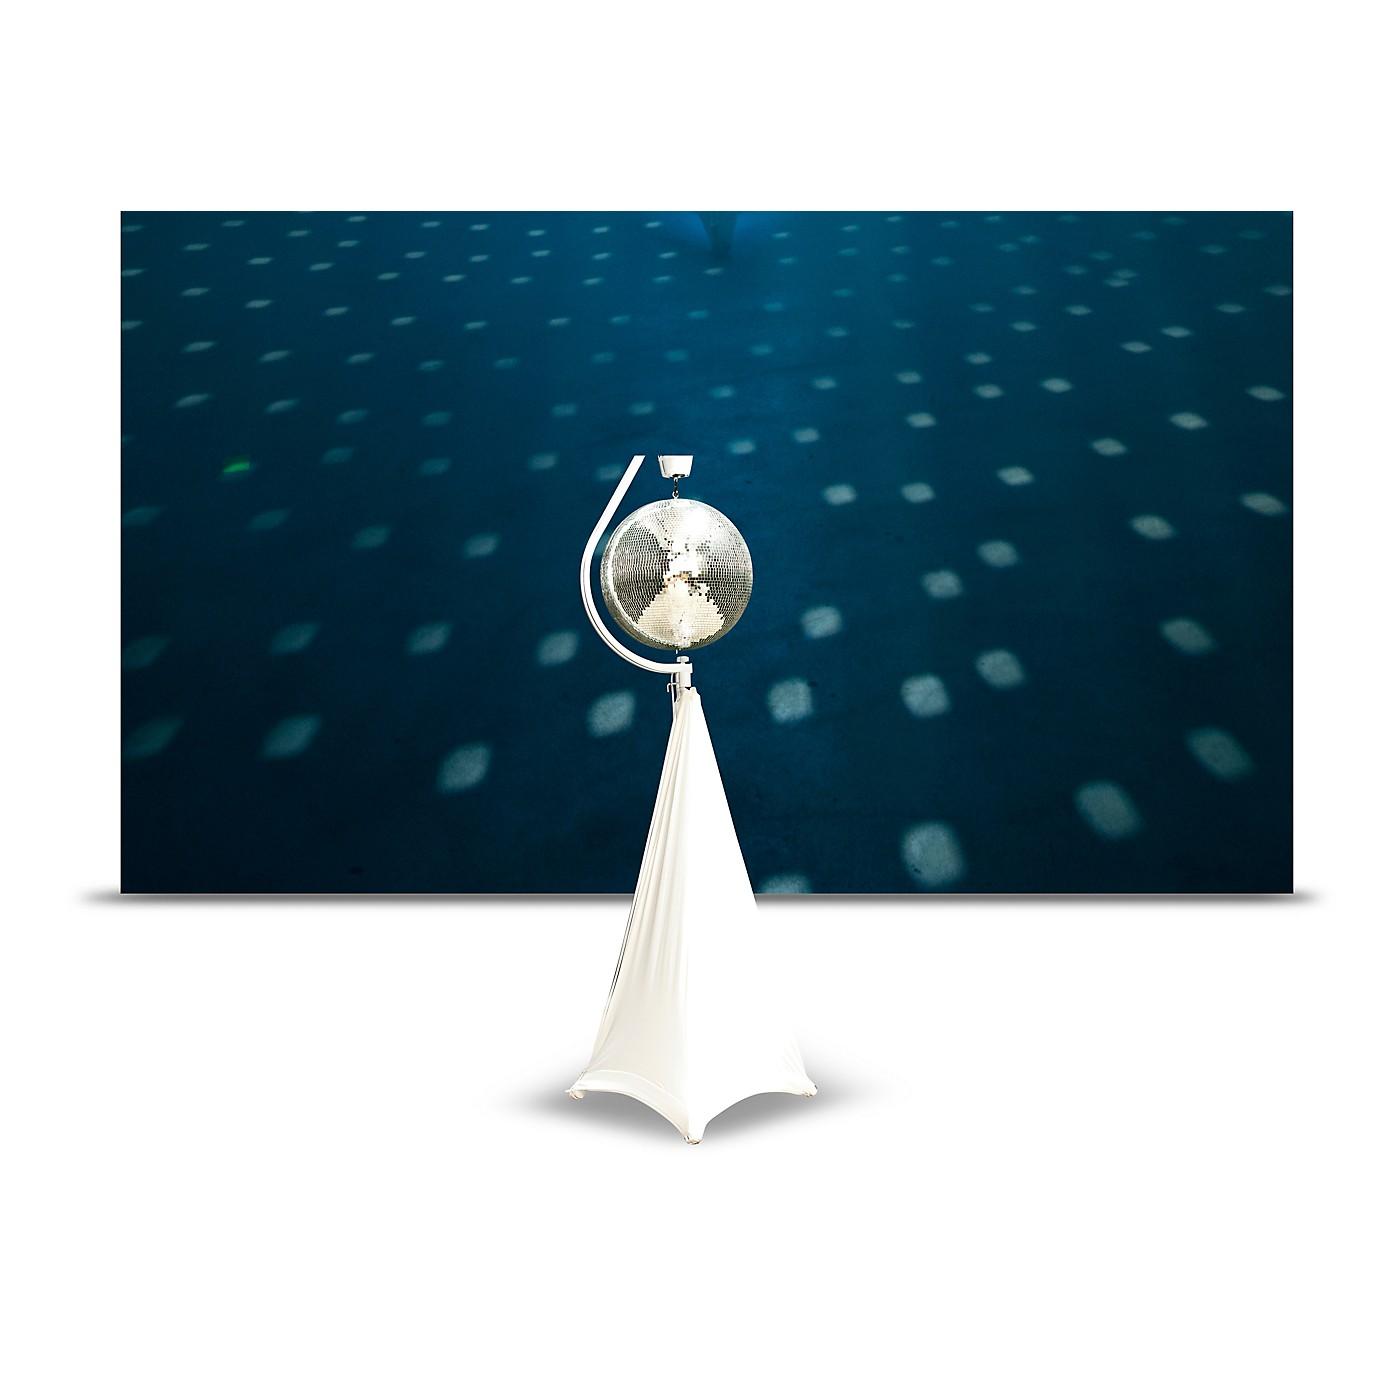 Eliminator Lighting Decor MBSK Mirror Ball Stand With Motor thumbnail